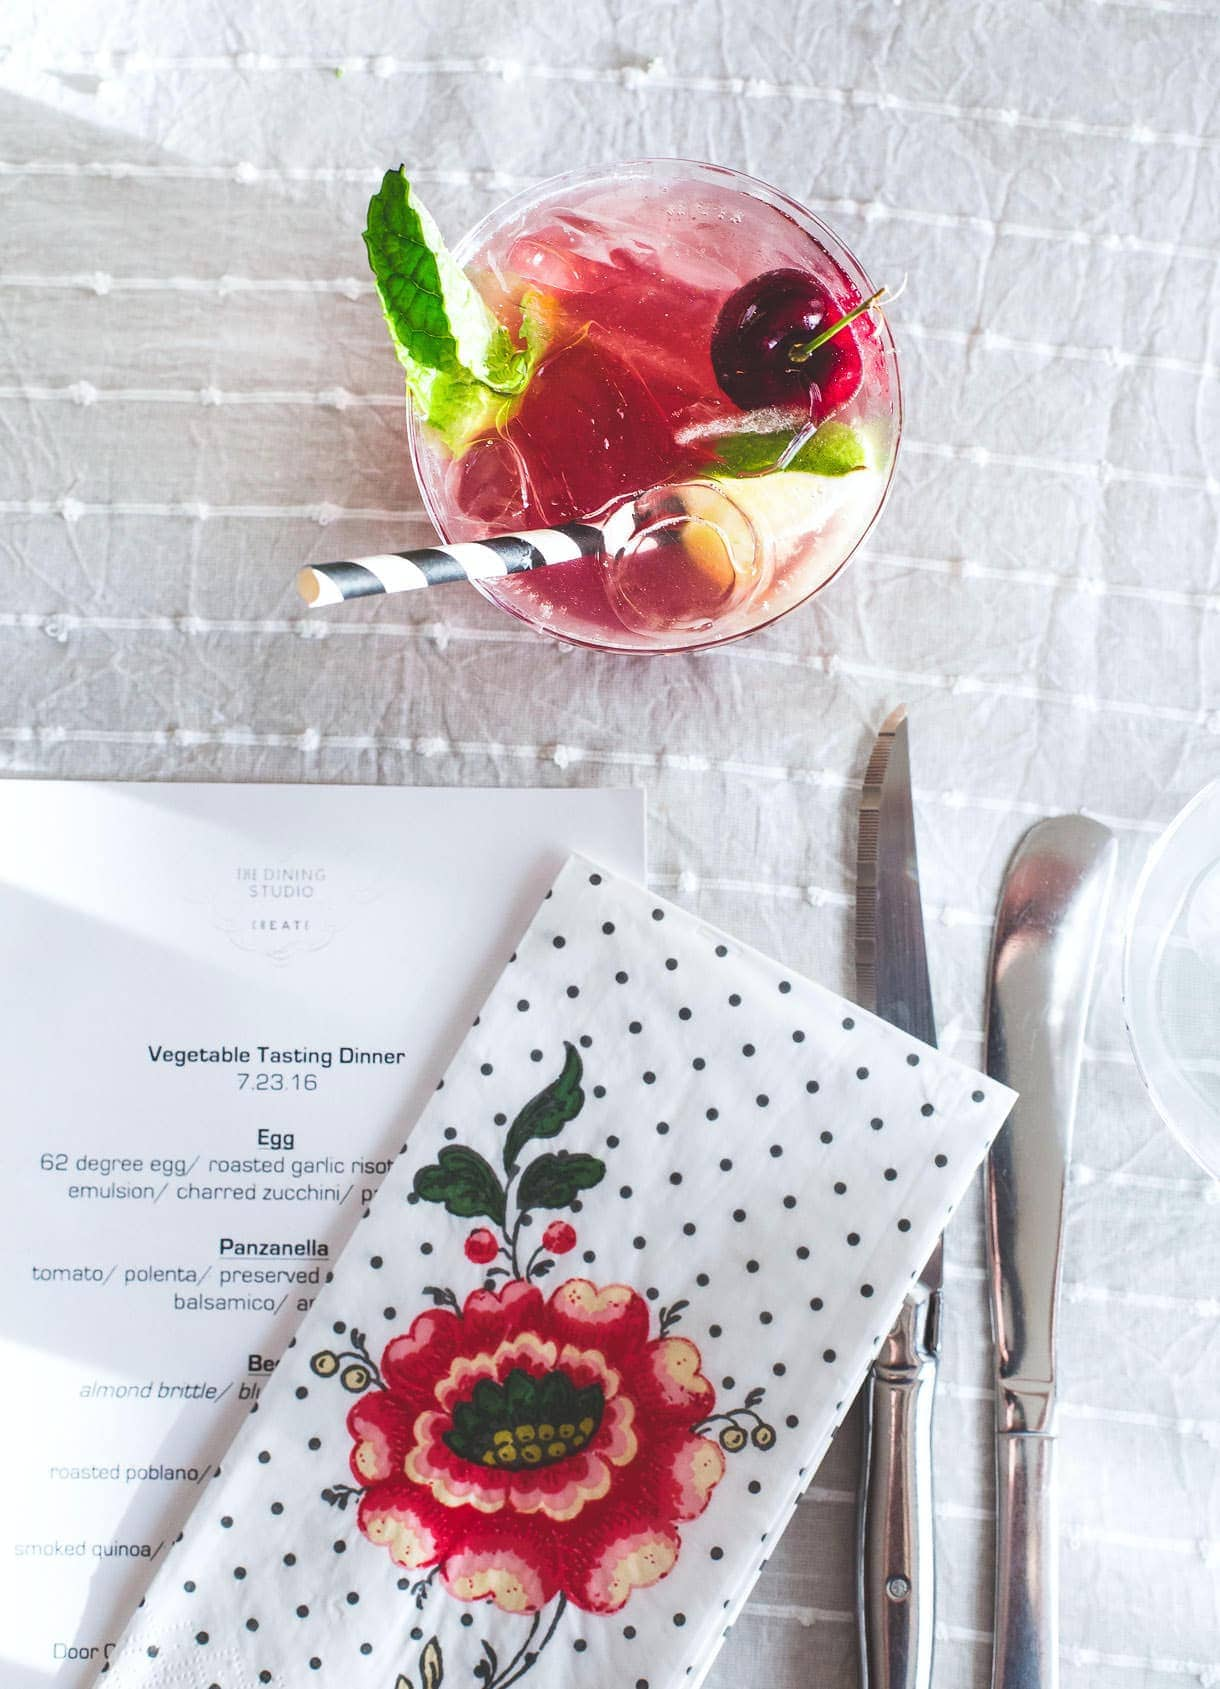 La Croix Mocktail Dinner